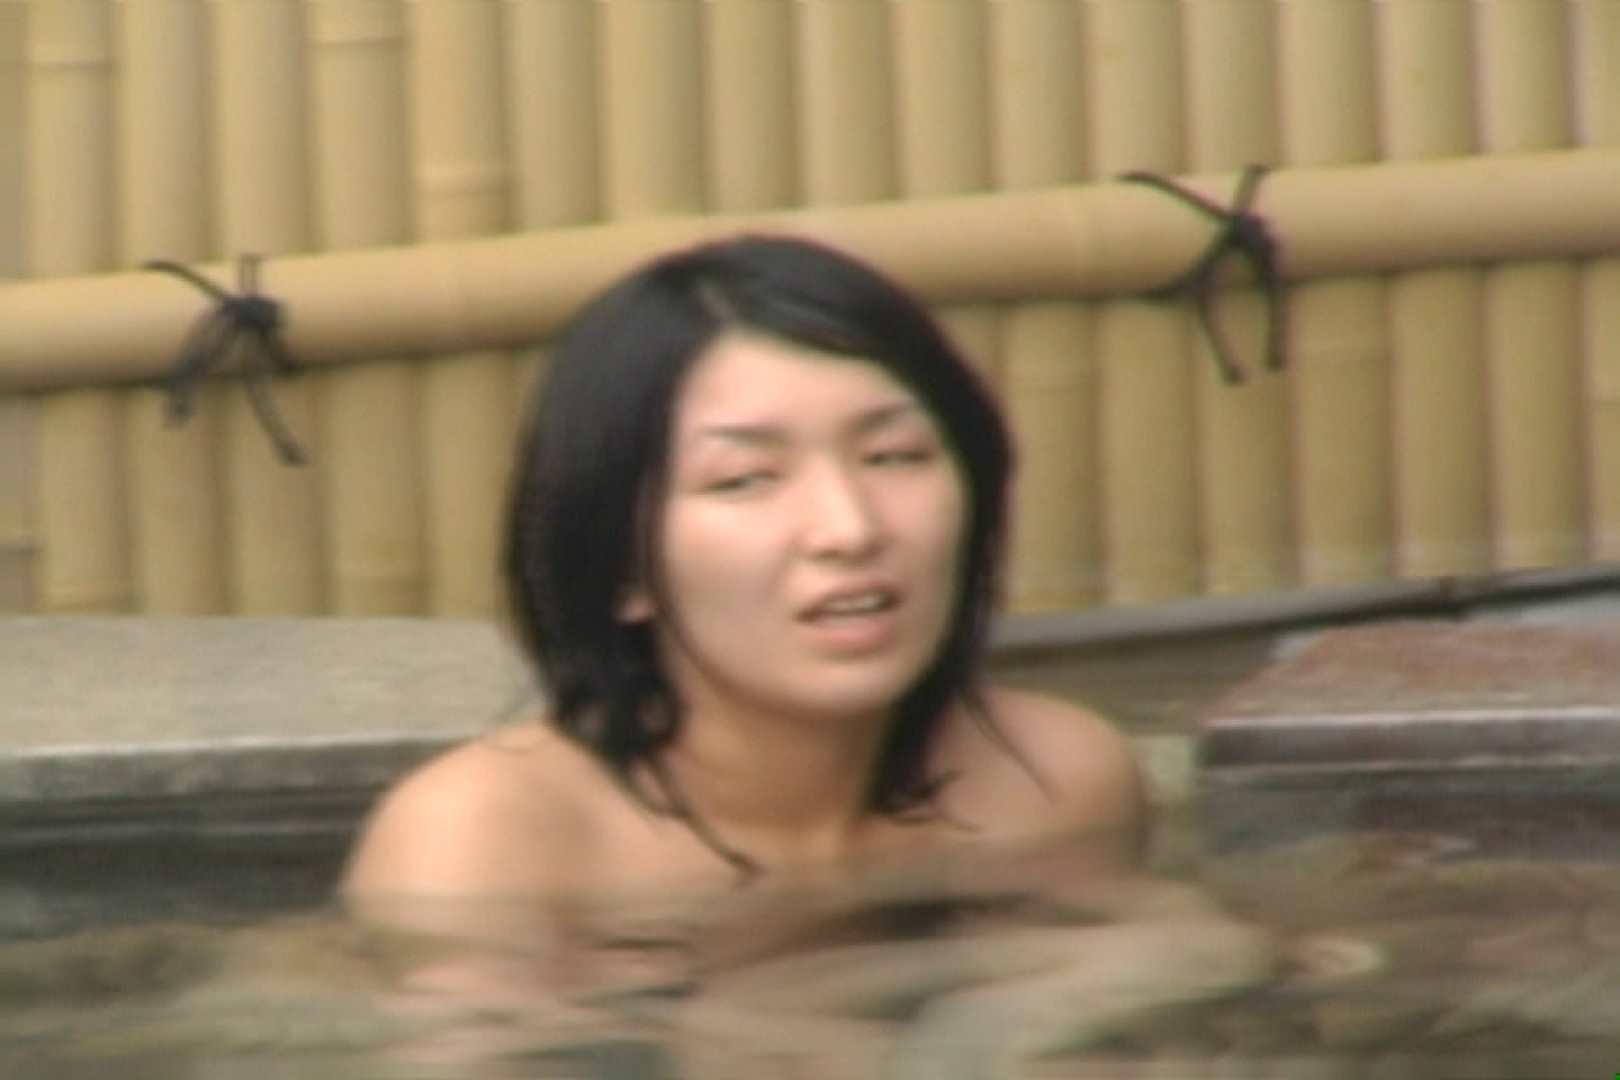 Aquaな露天風呂Vol.618 露天風呂 エロ画像 67連発 29